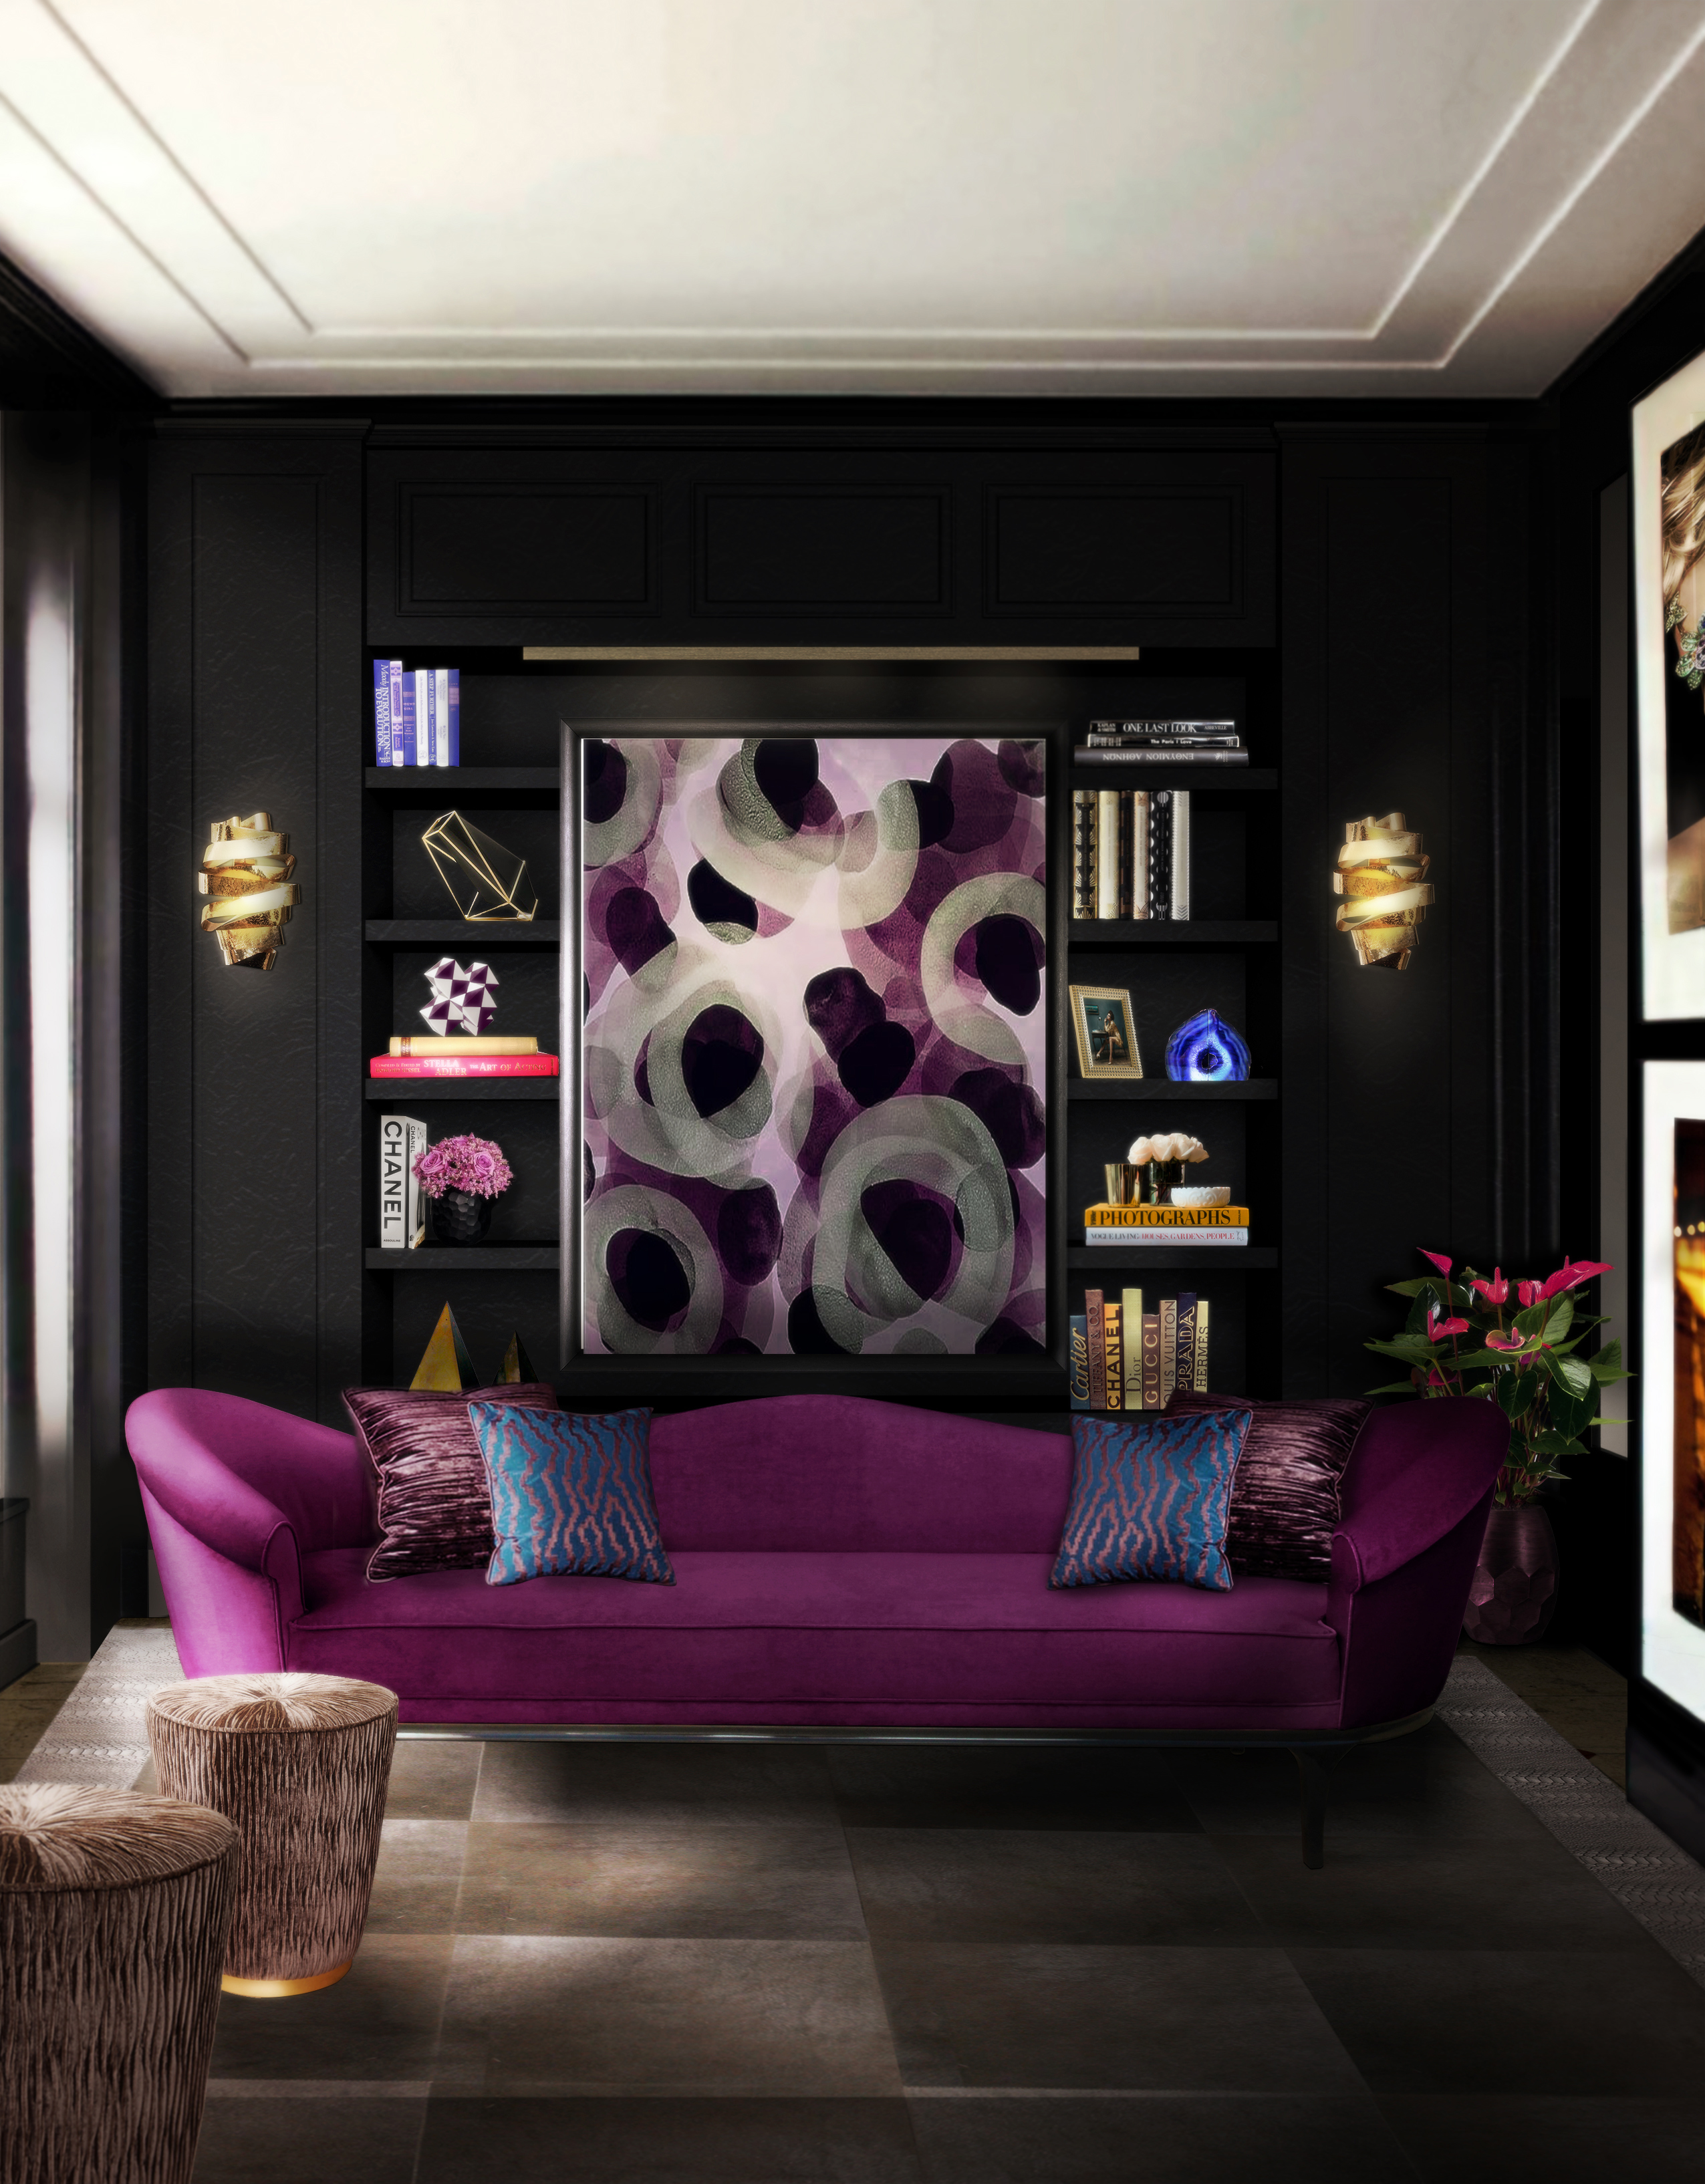 living room ideas Living Room Ideas For a Luxurious Interior Design Project Living Room Ideas For a Luxurious Interior Design Project 15